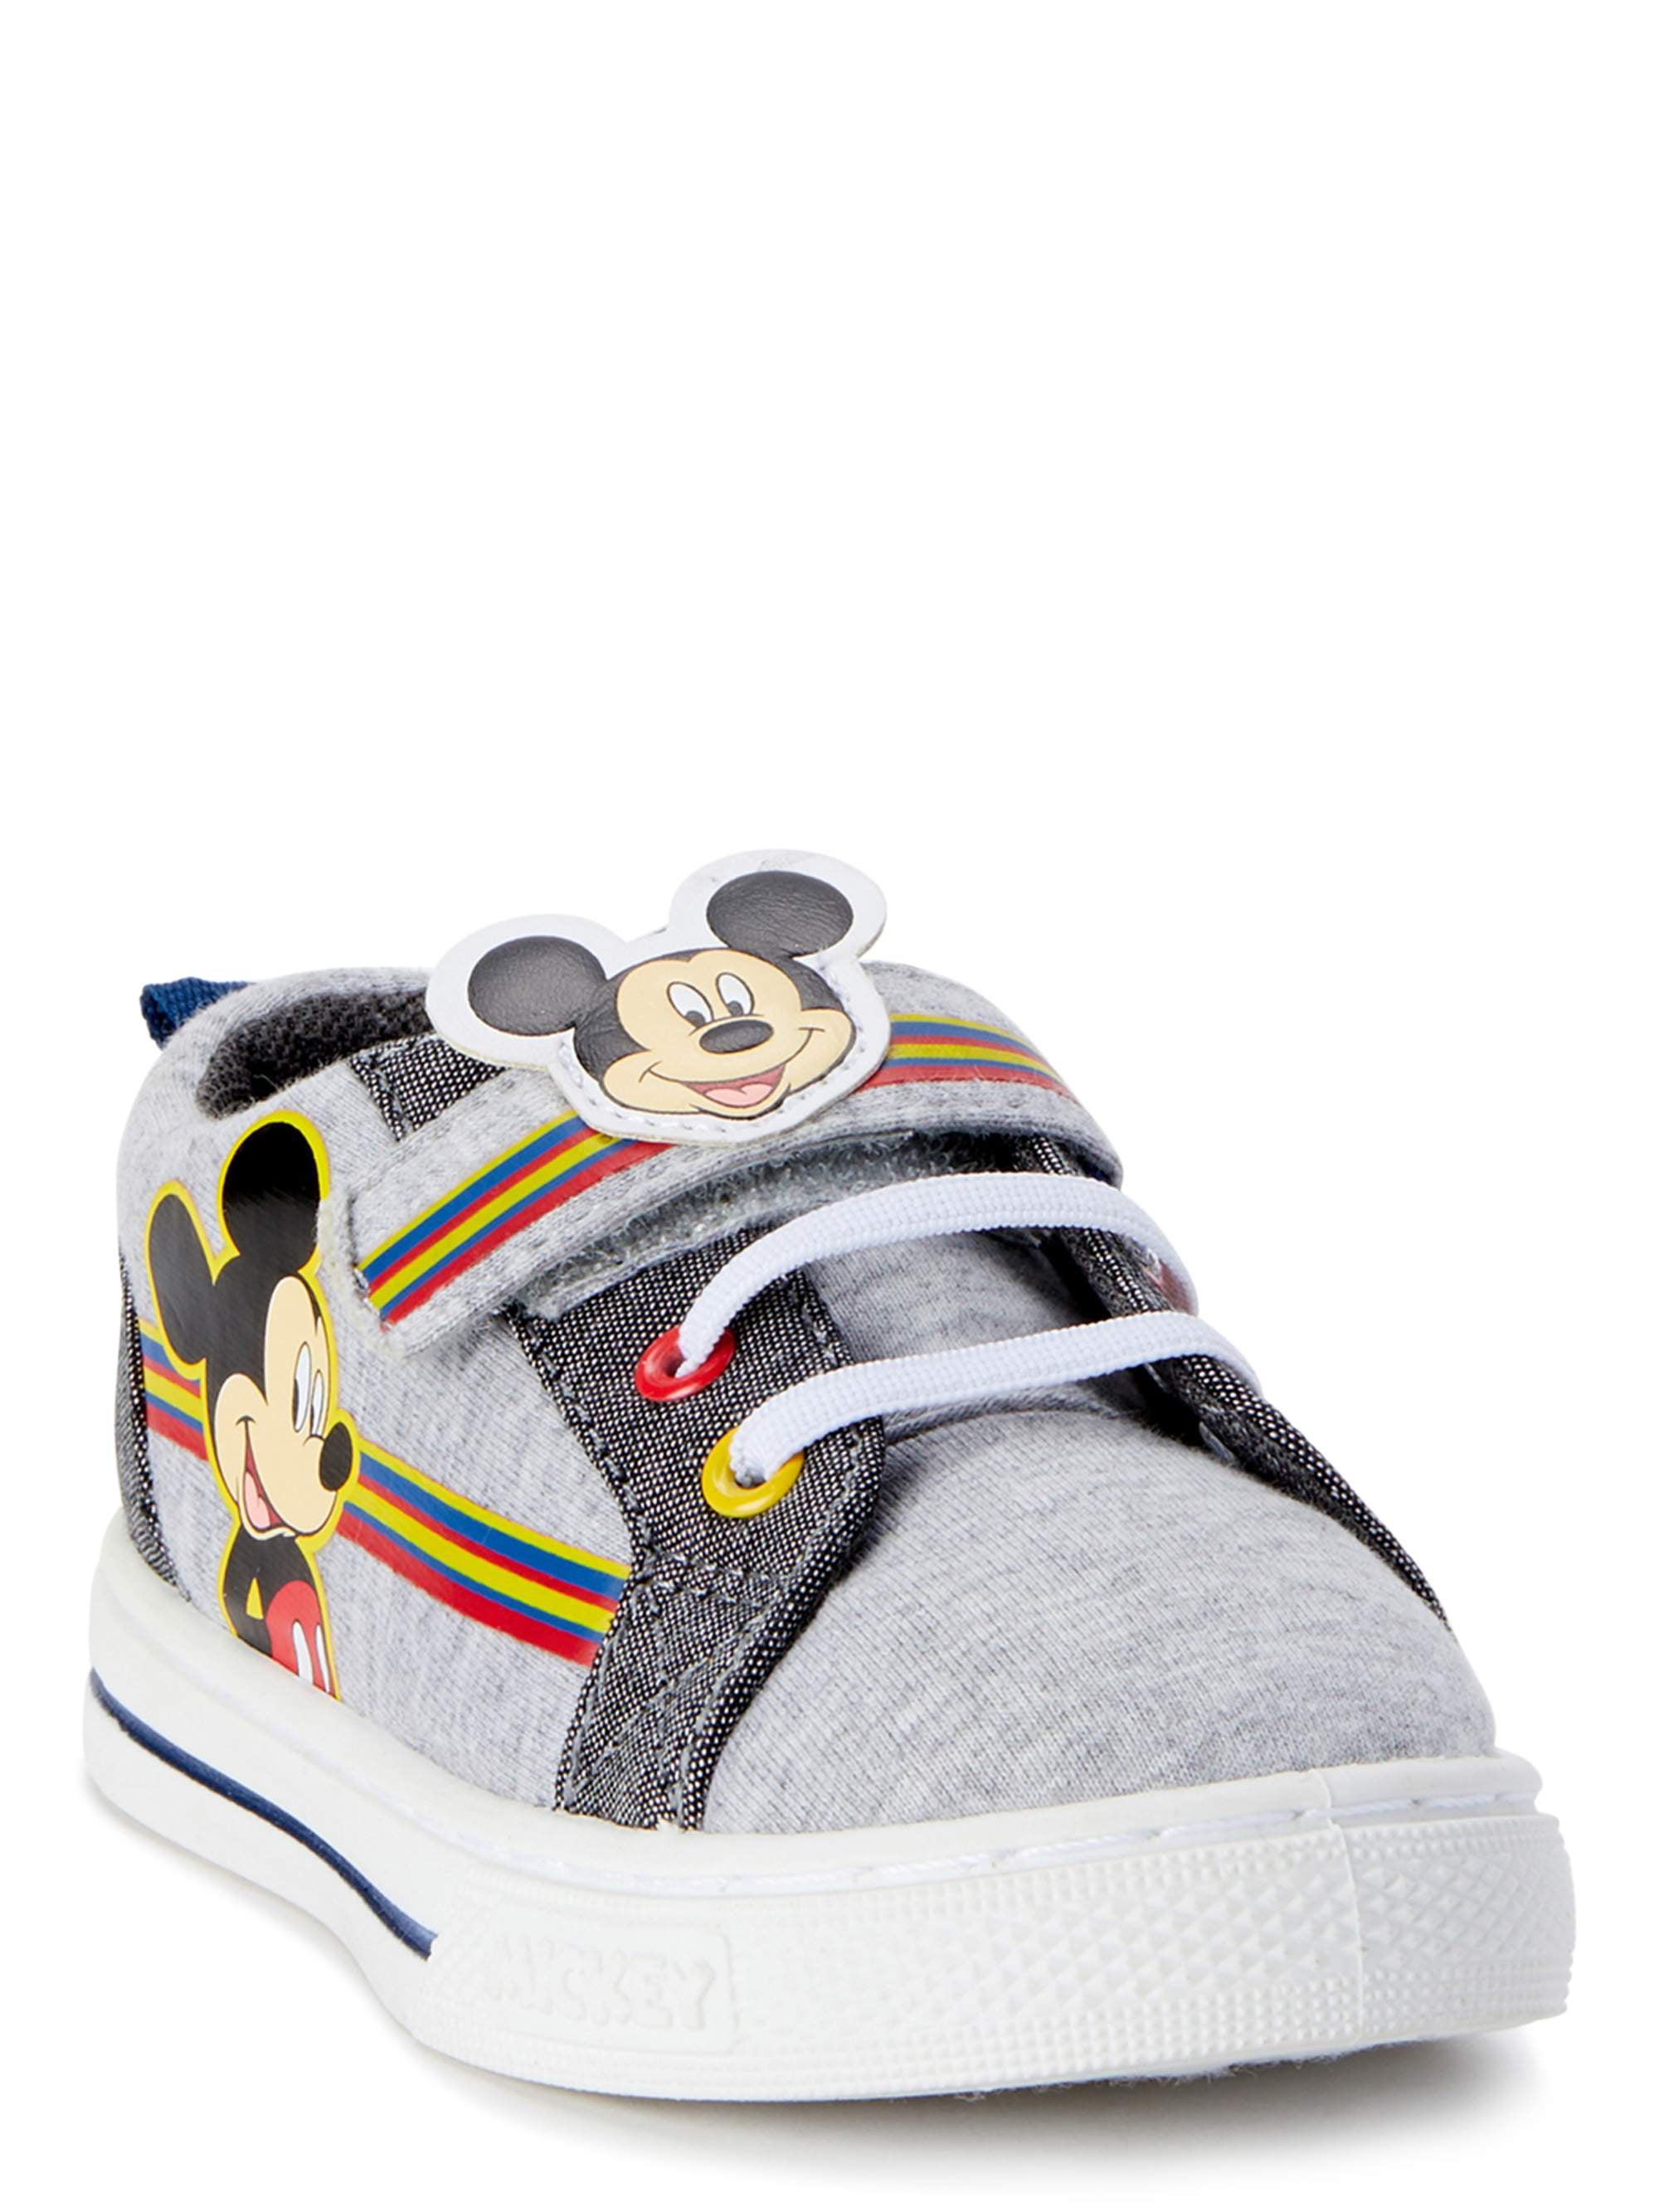 Disney Mickey Mouse Casual Strap Shoe (Toddler Boys)